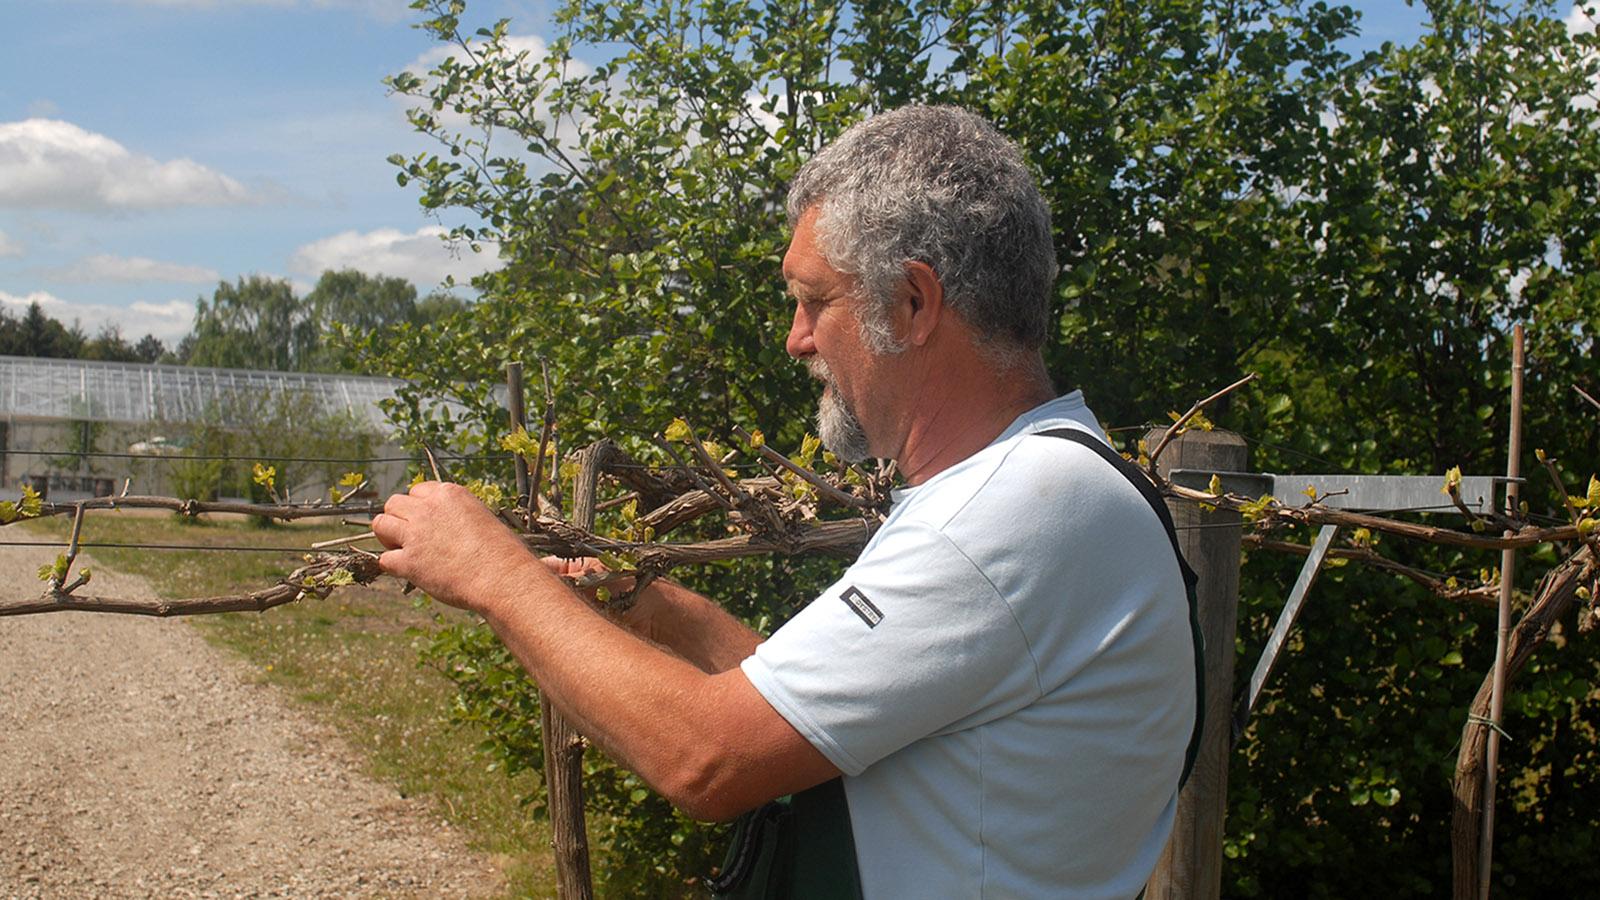 Dansk VinCenter: Jørgen Hinsch bei der Arbeit im Weinberg. Foto: Hilke Maunder